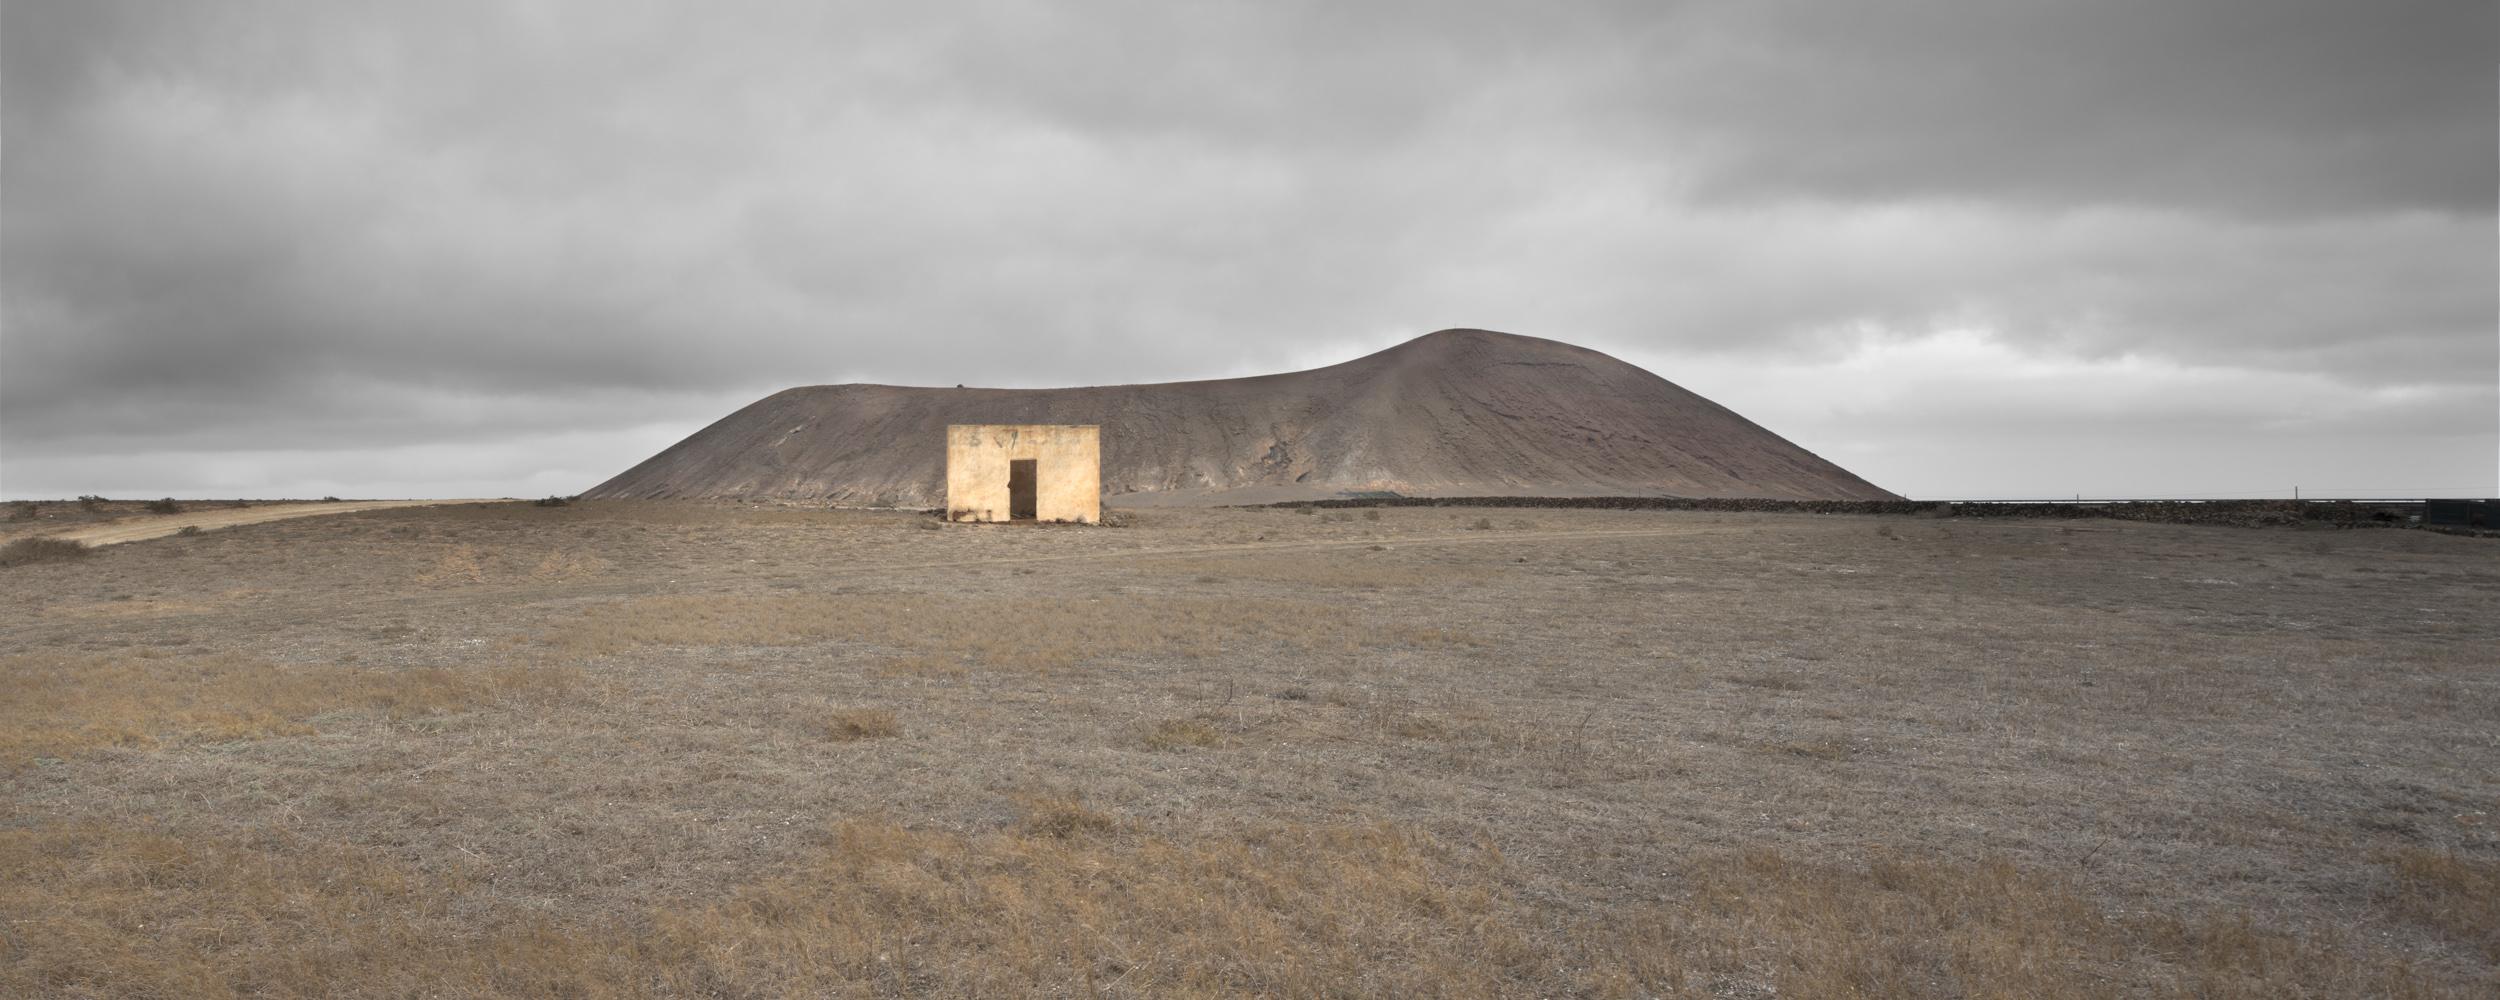 lancelotto's house - THE ISLAND OF THE HORIZON - cesar azcarate, photography